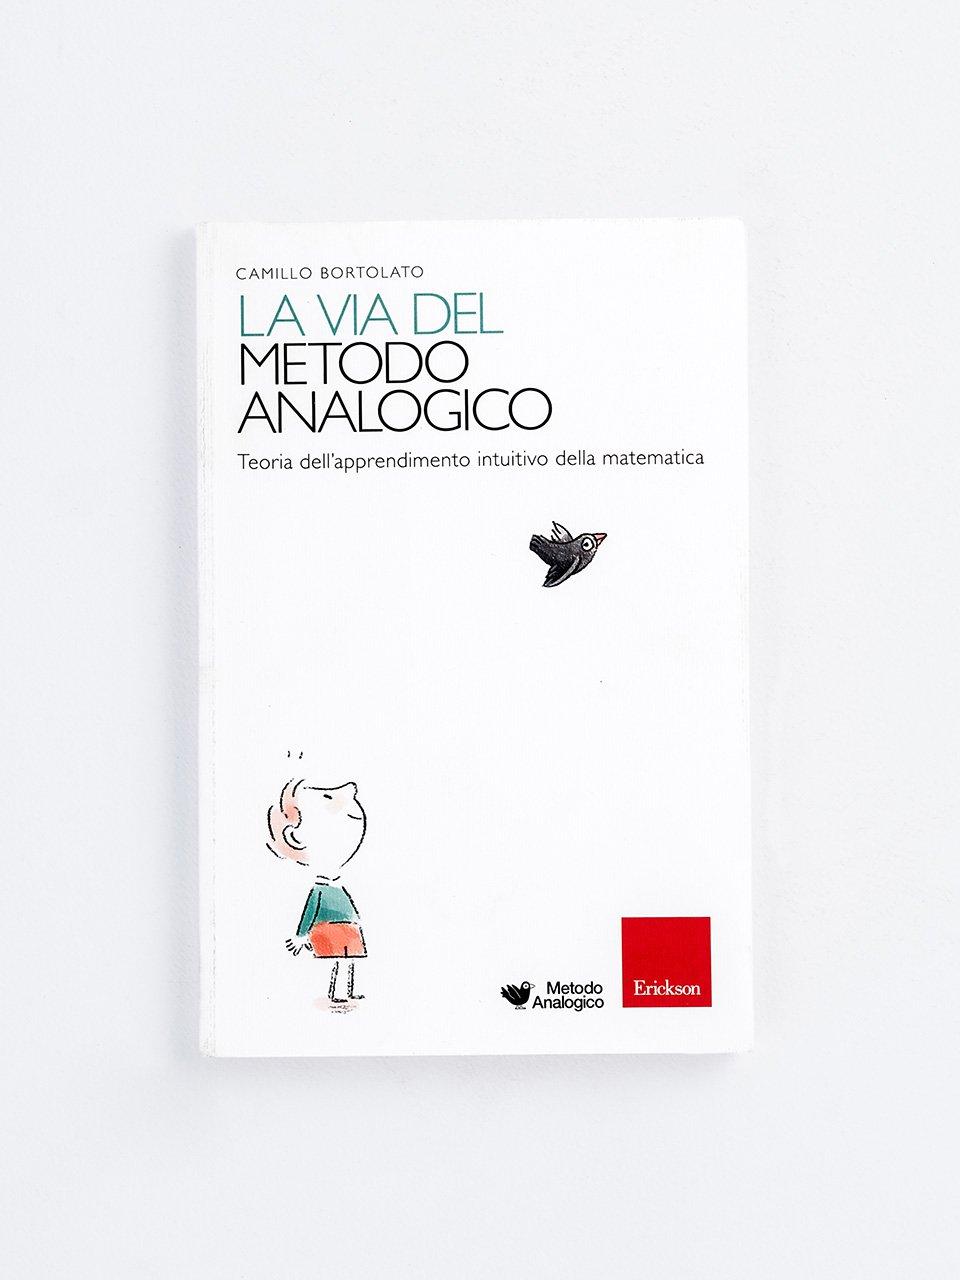 La via del metodo analogico - La scuola nel bosco - Libri - Erickson